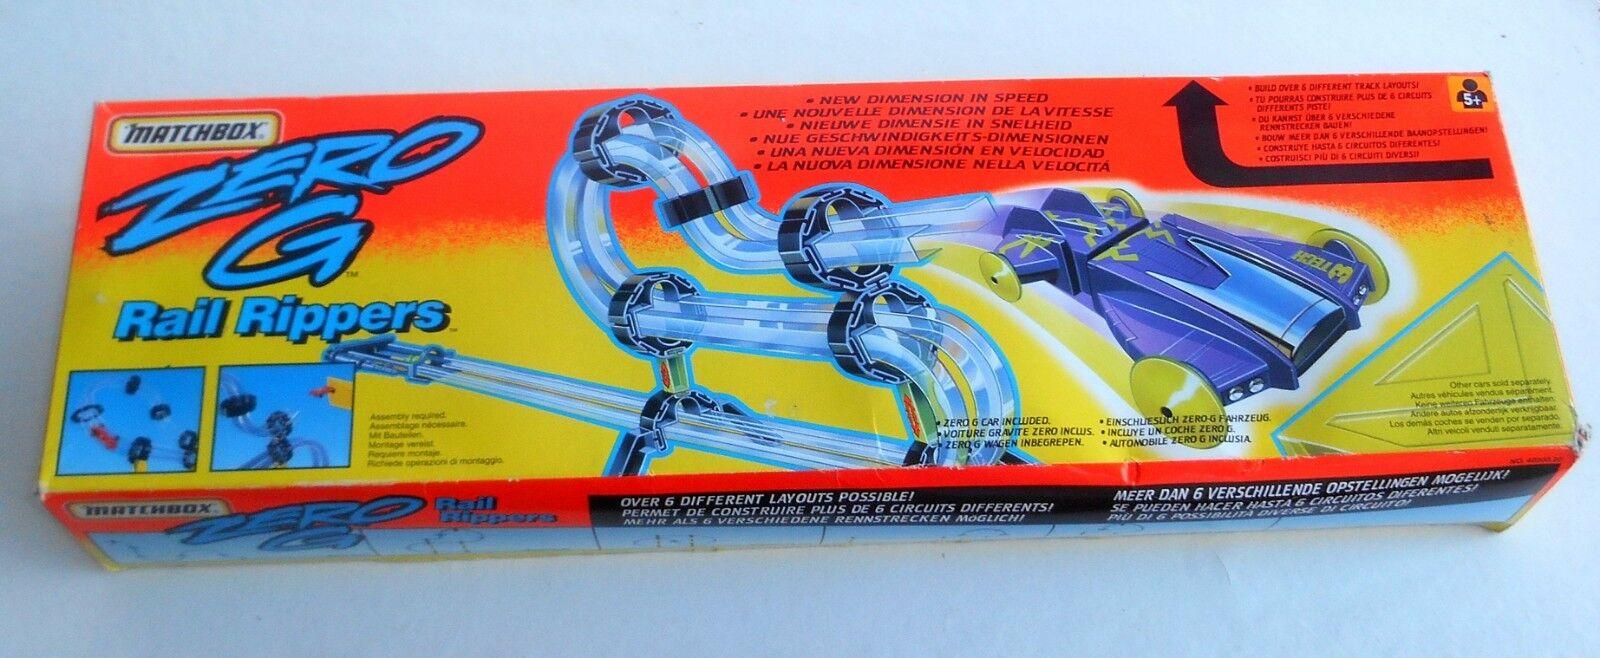 Vintage 1994 Matchbox Lesney Superfast  ZERO G - RAIL RIPPER  Box Instructions